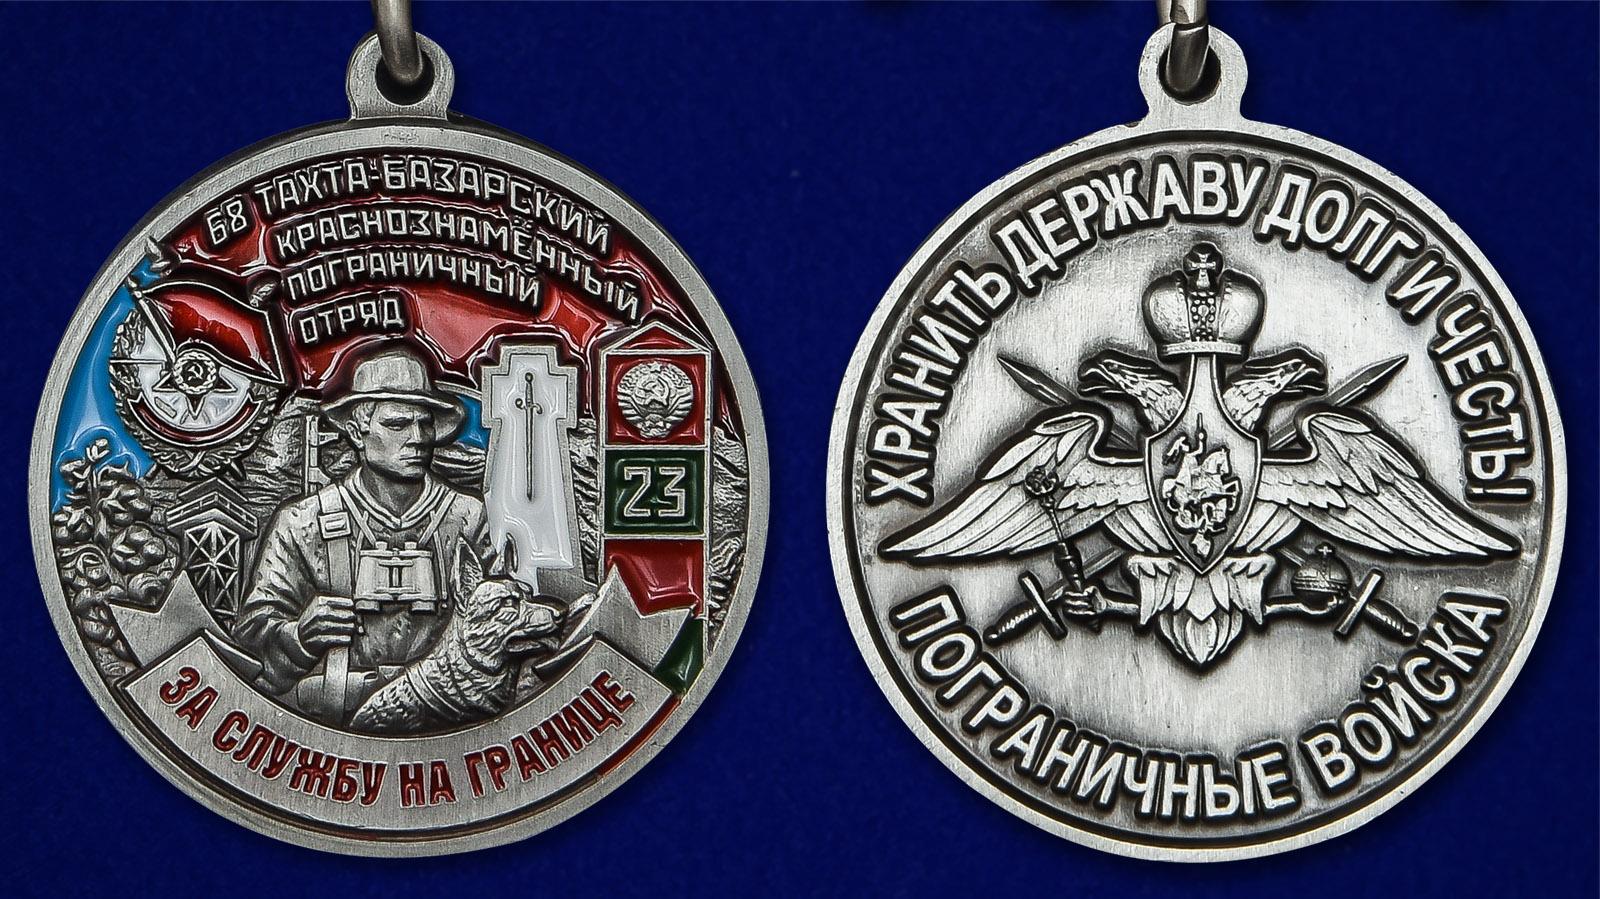 Латунная медаль За службу на границе (68 Тахта-Базарский ПогО) - аверс и реверс